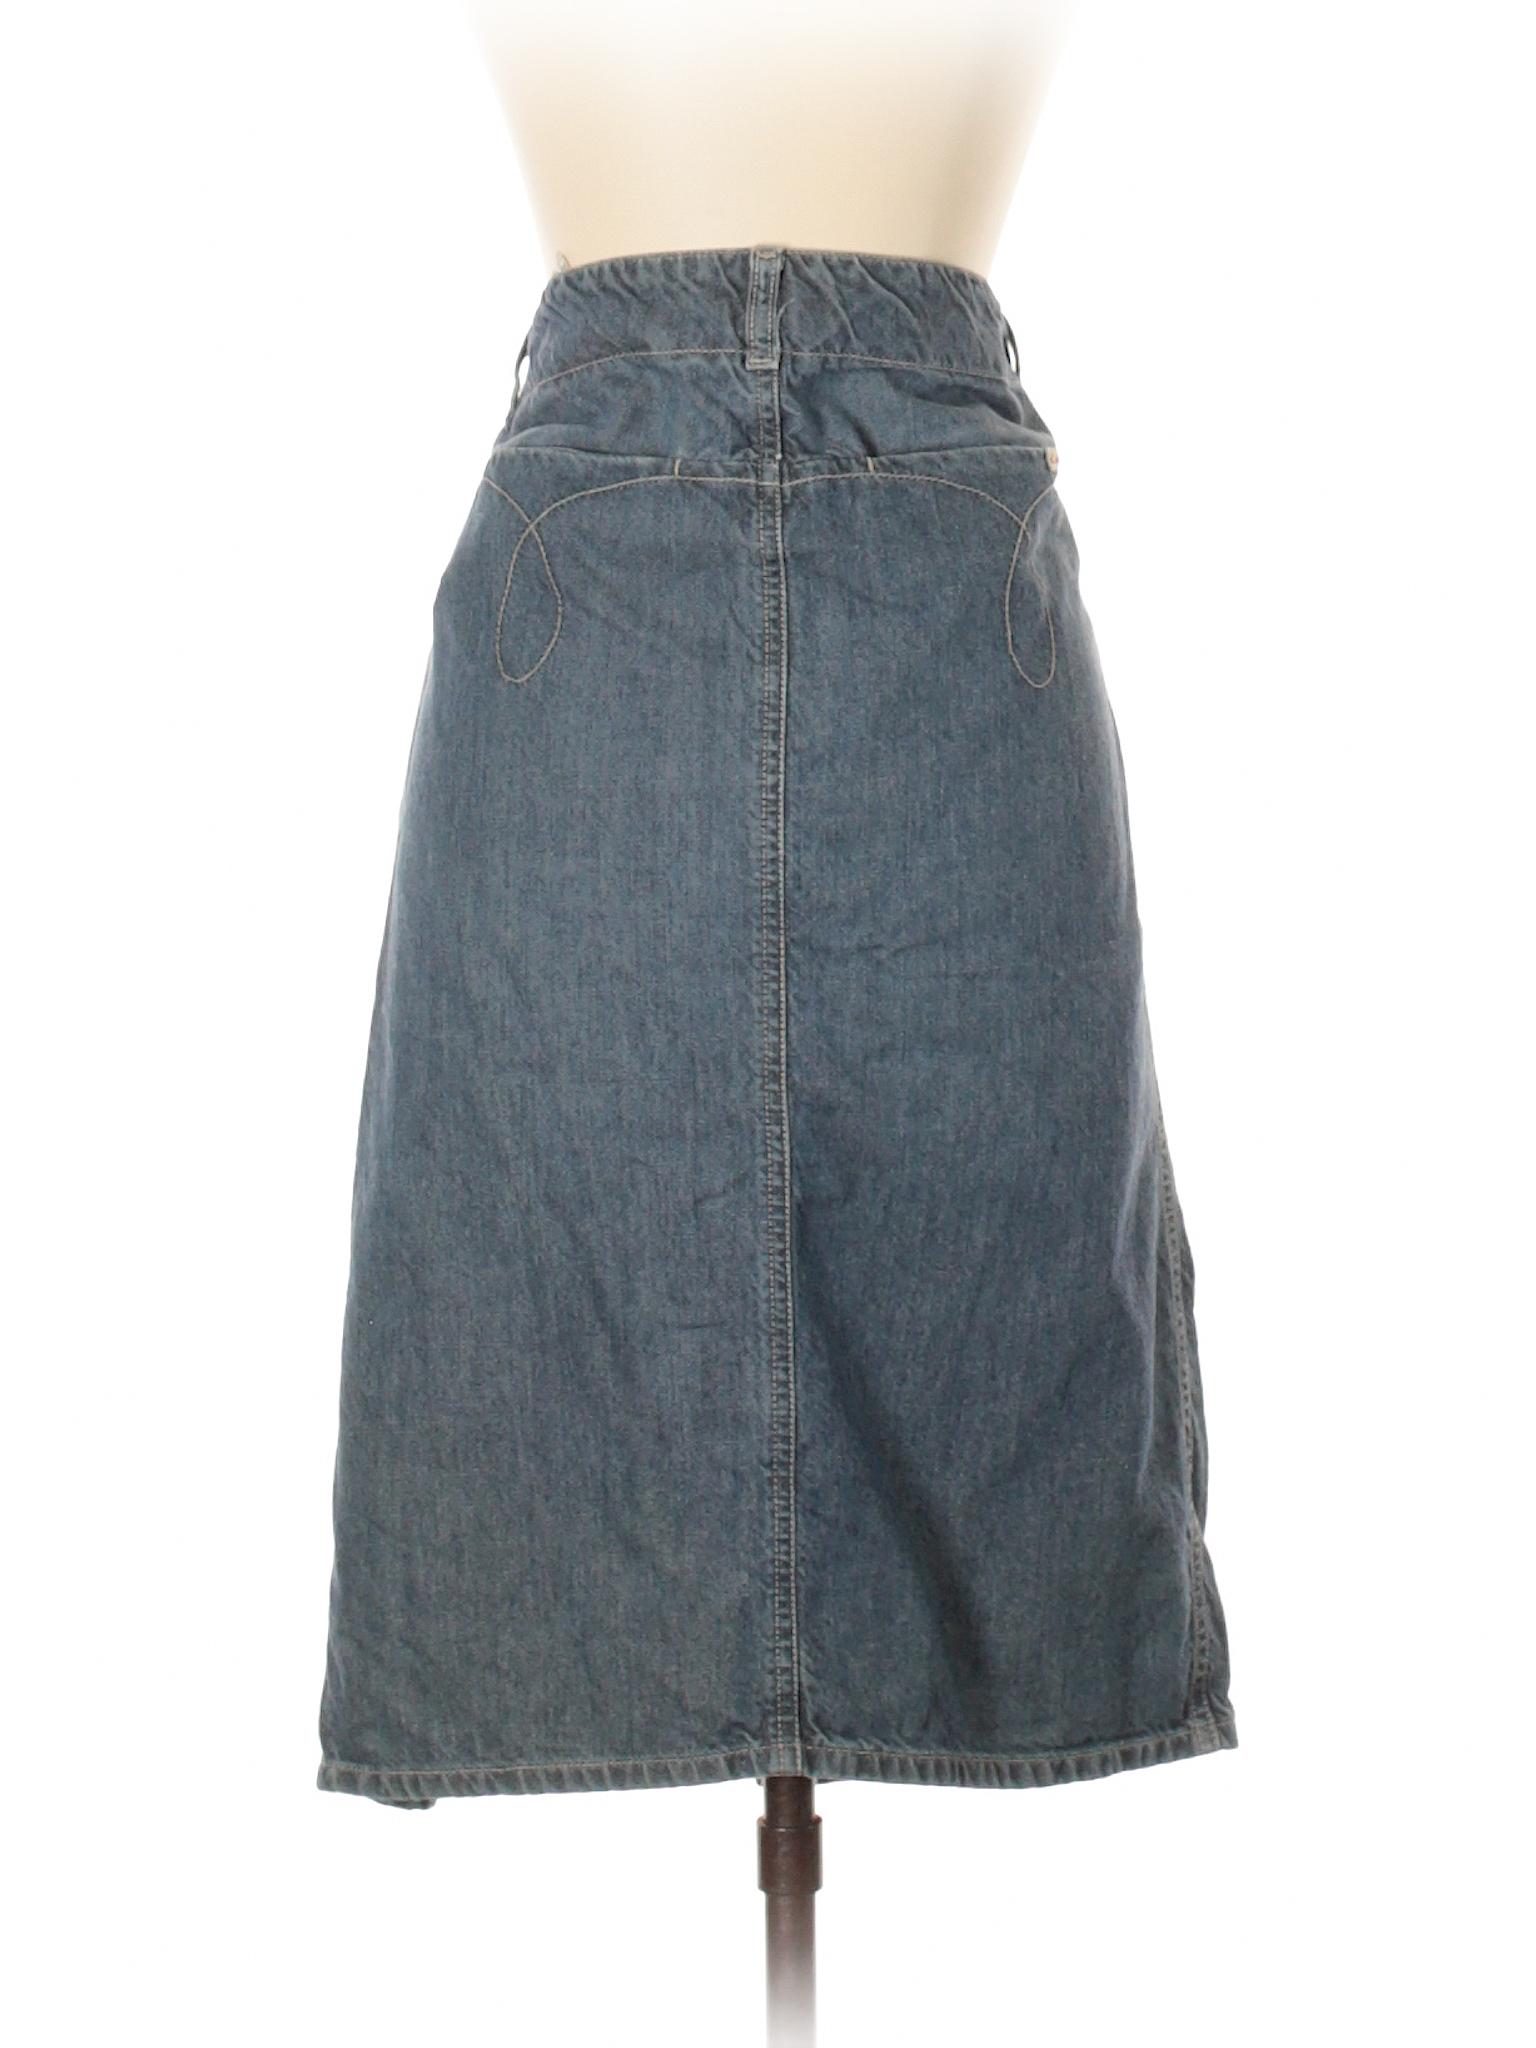 Skirt Boutique Denim Boutique Denim q1XFx